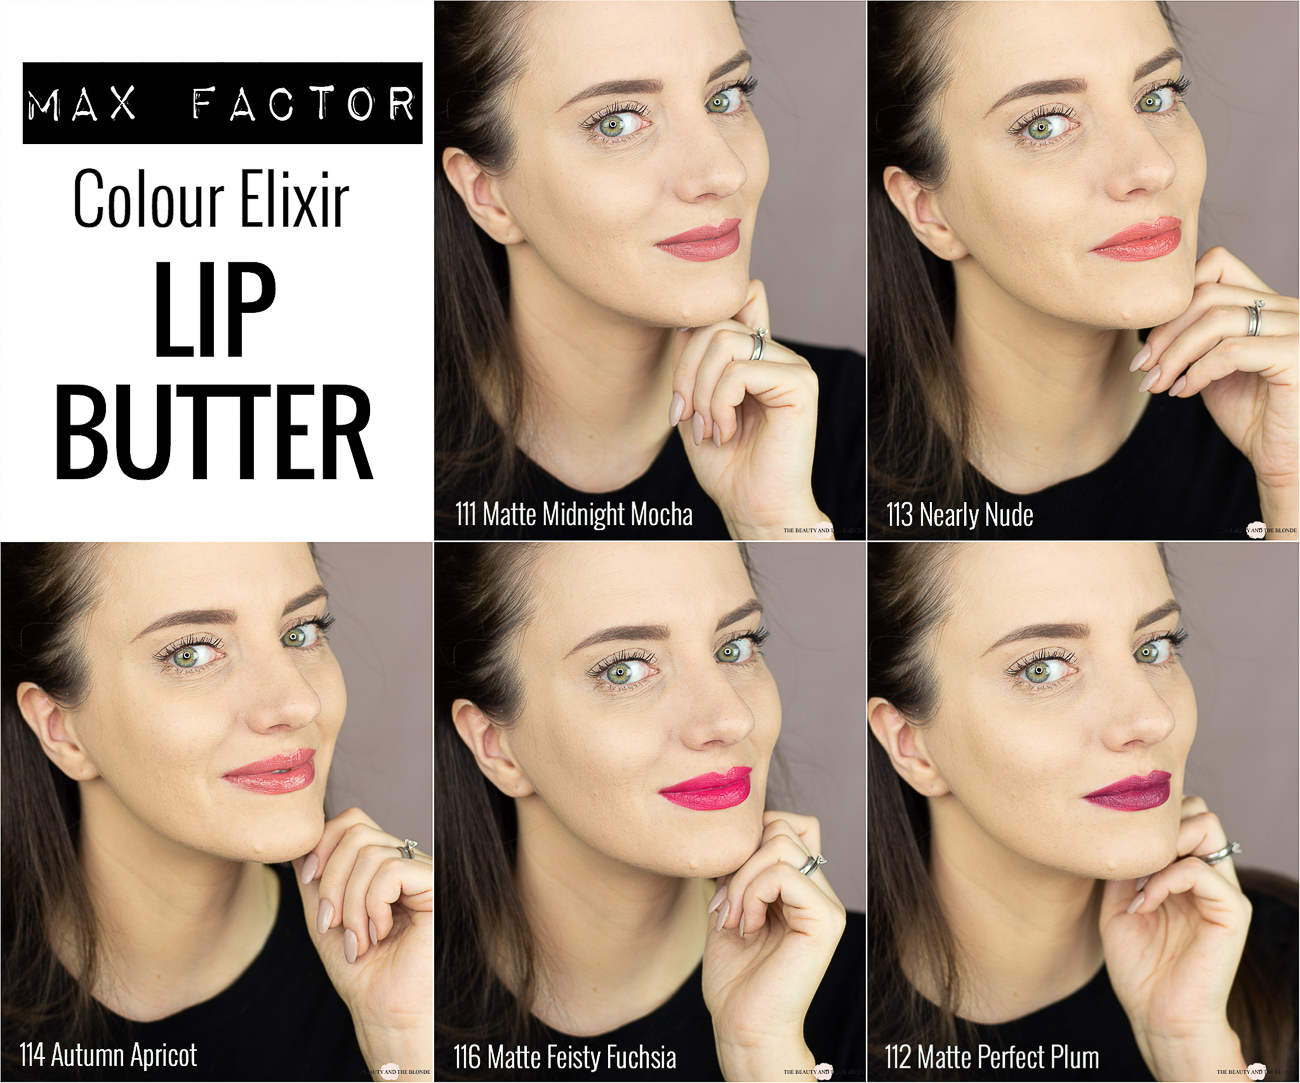 Max Factor Colour Elixir Lip Butters Lip Swatches